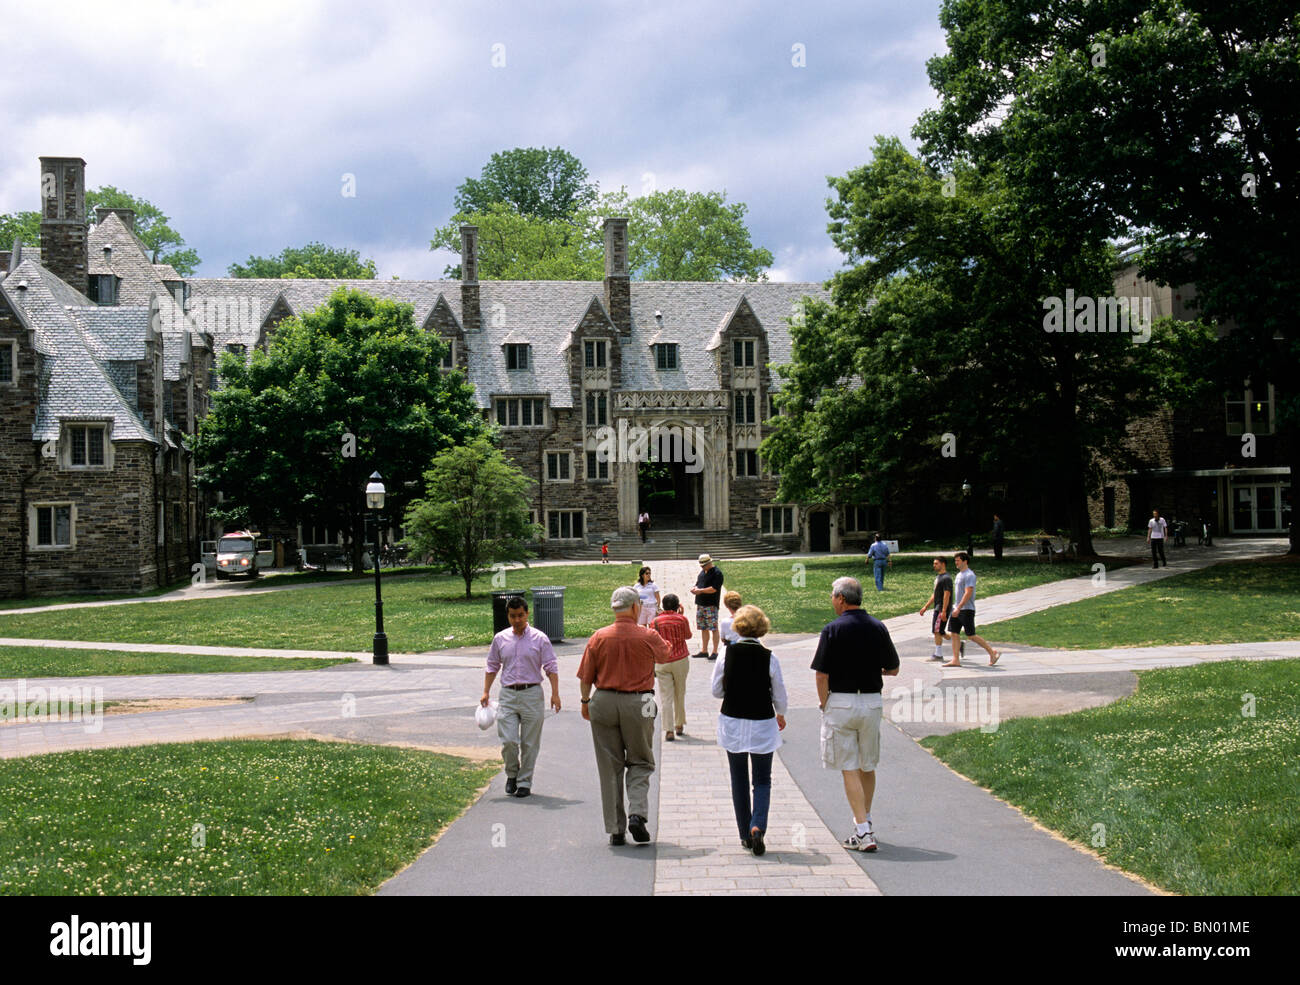 Princeton University People Walking on Campus in Front of Lockhart Hall USA - Stock Image